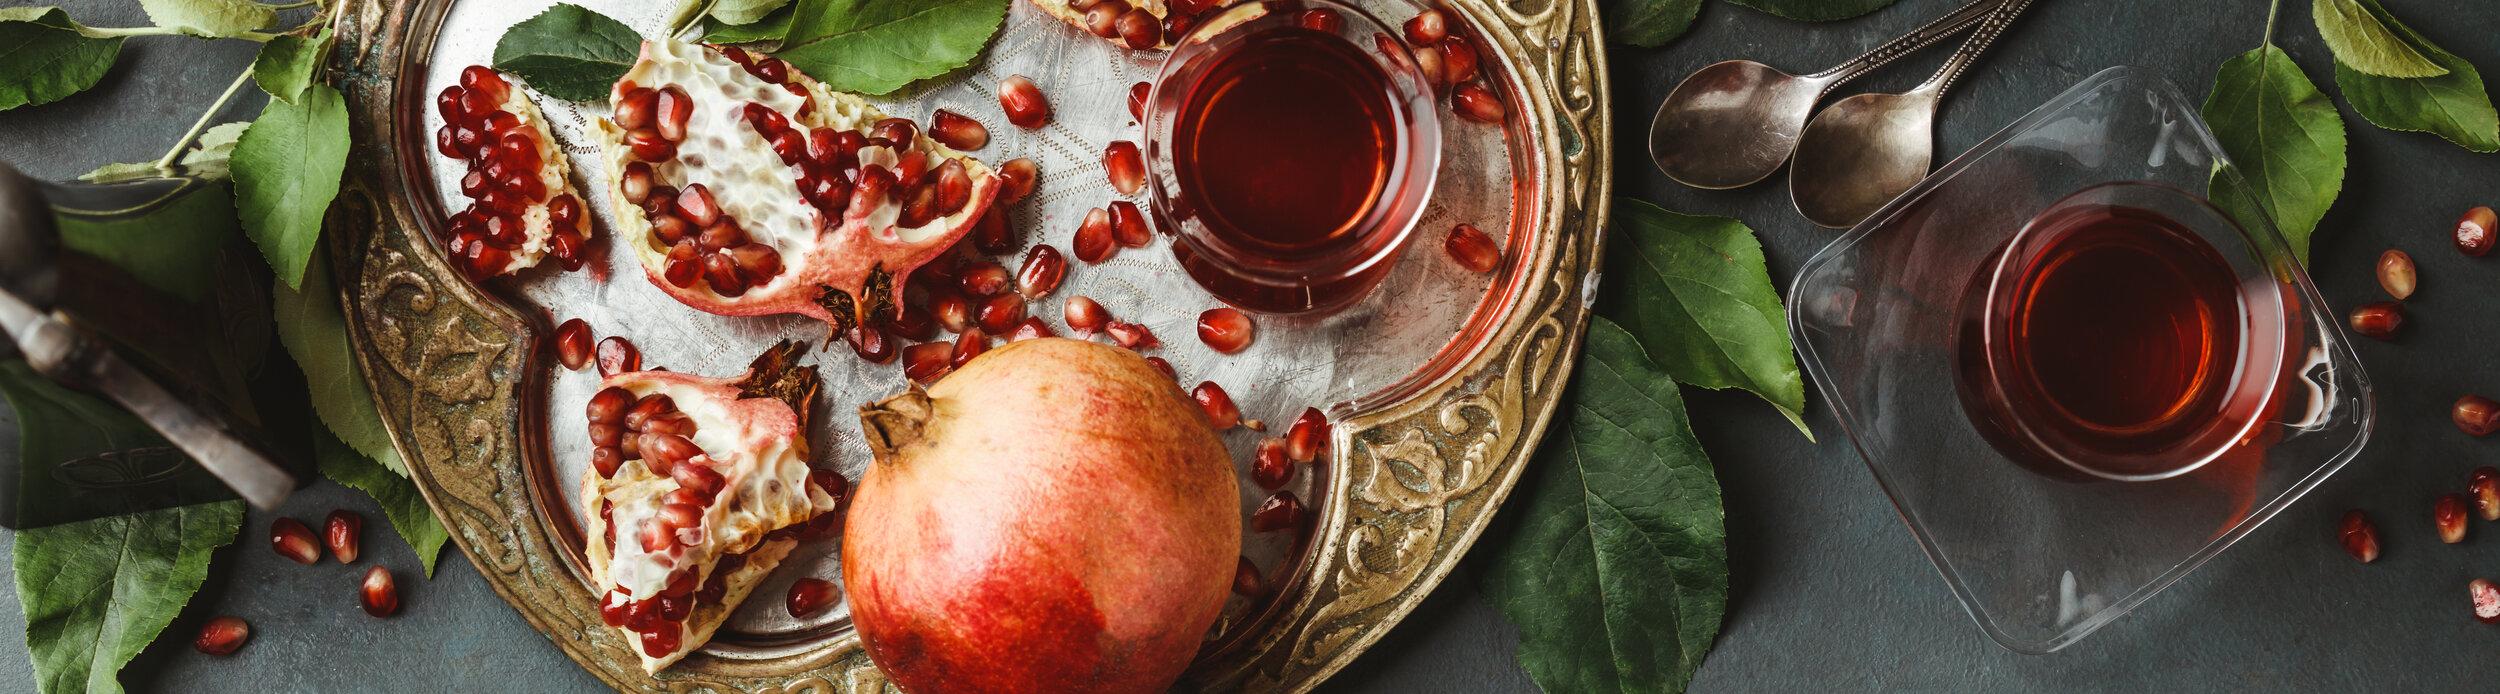 AdobeStock_313063184_pomegranate.jpg